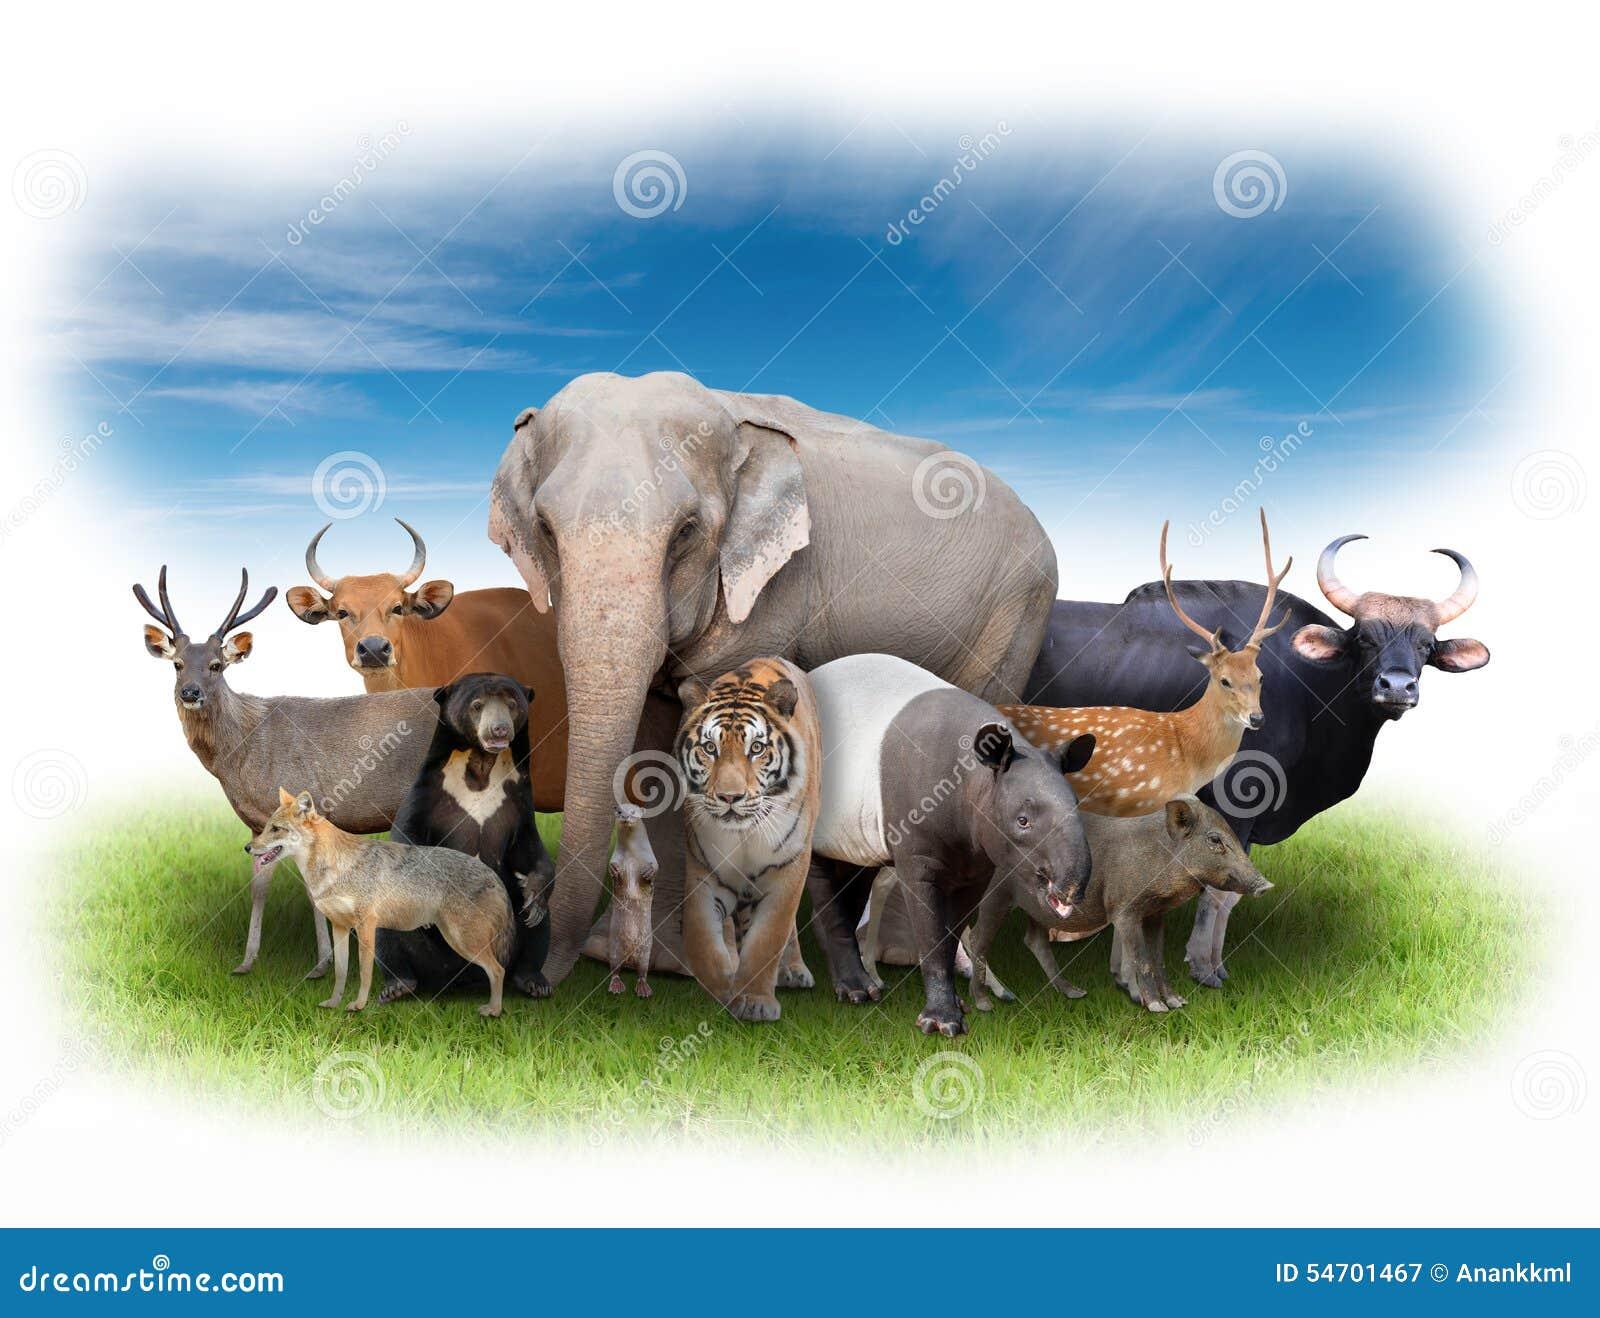 Group Of Asia Animals Stock Photo - Image: 54701467